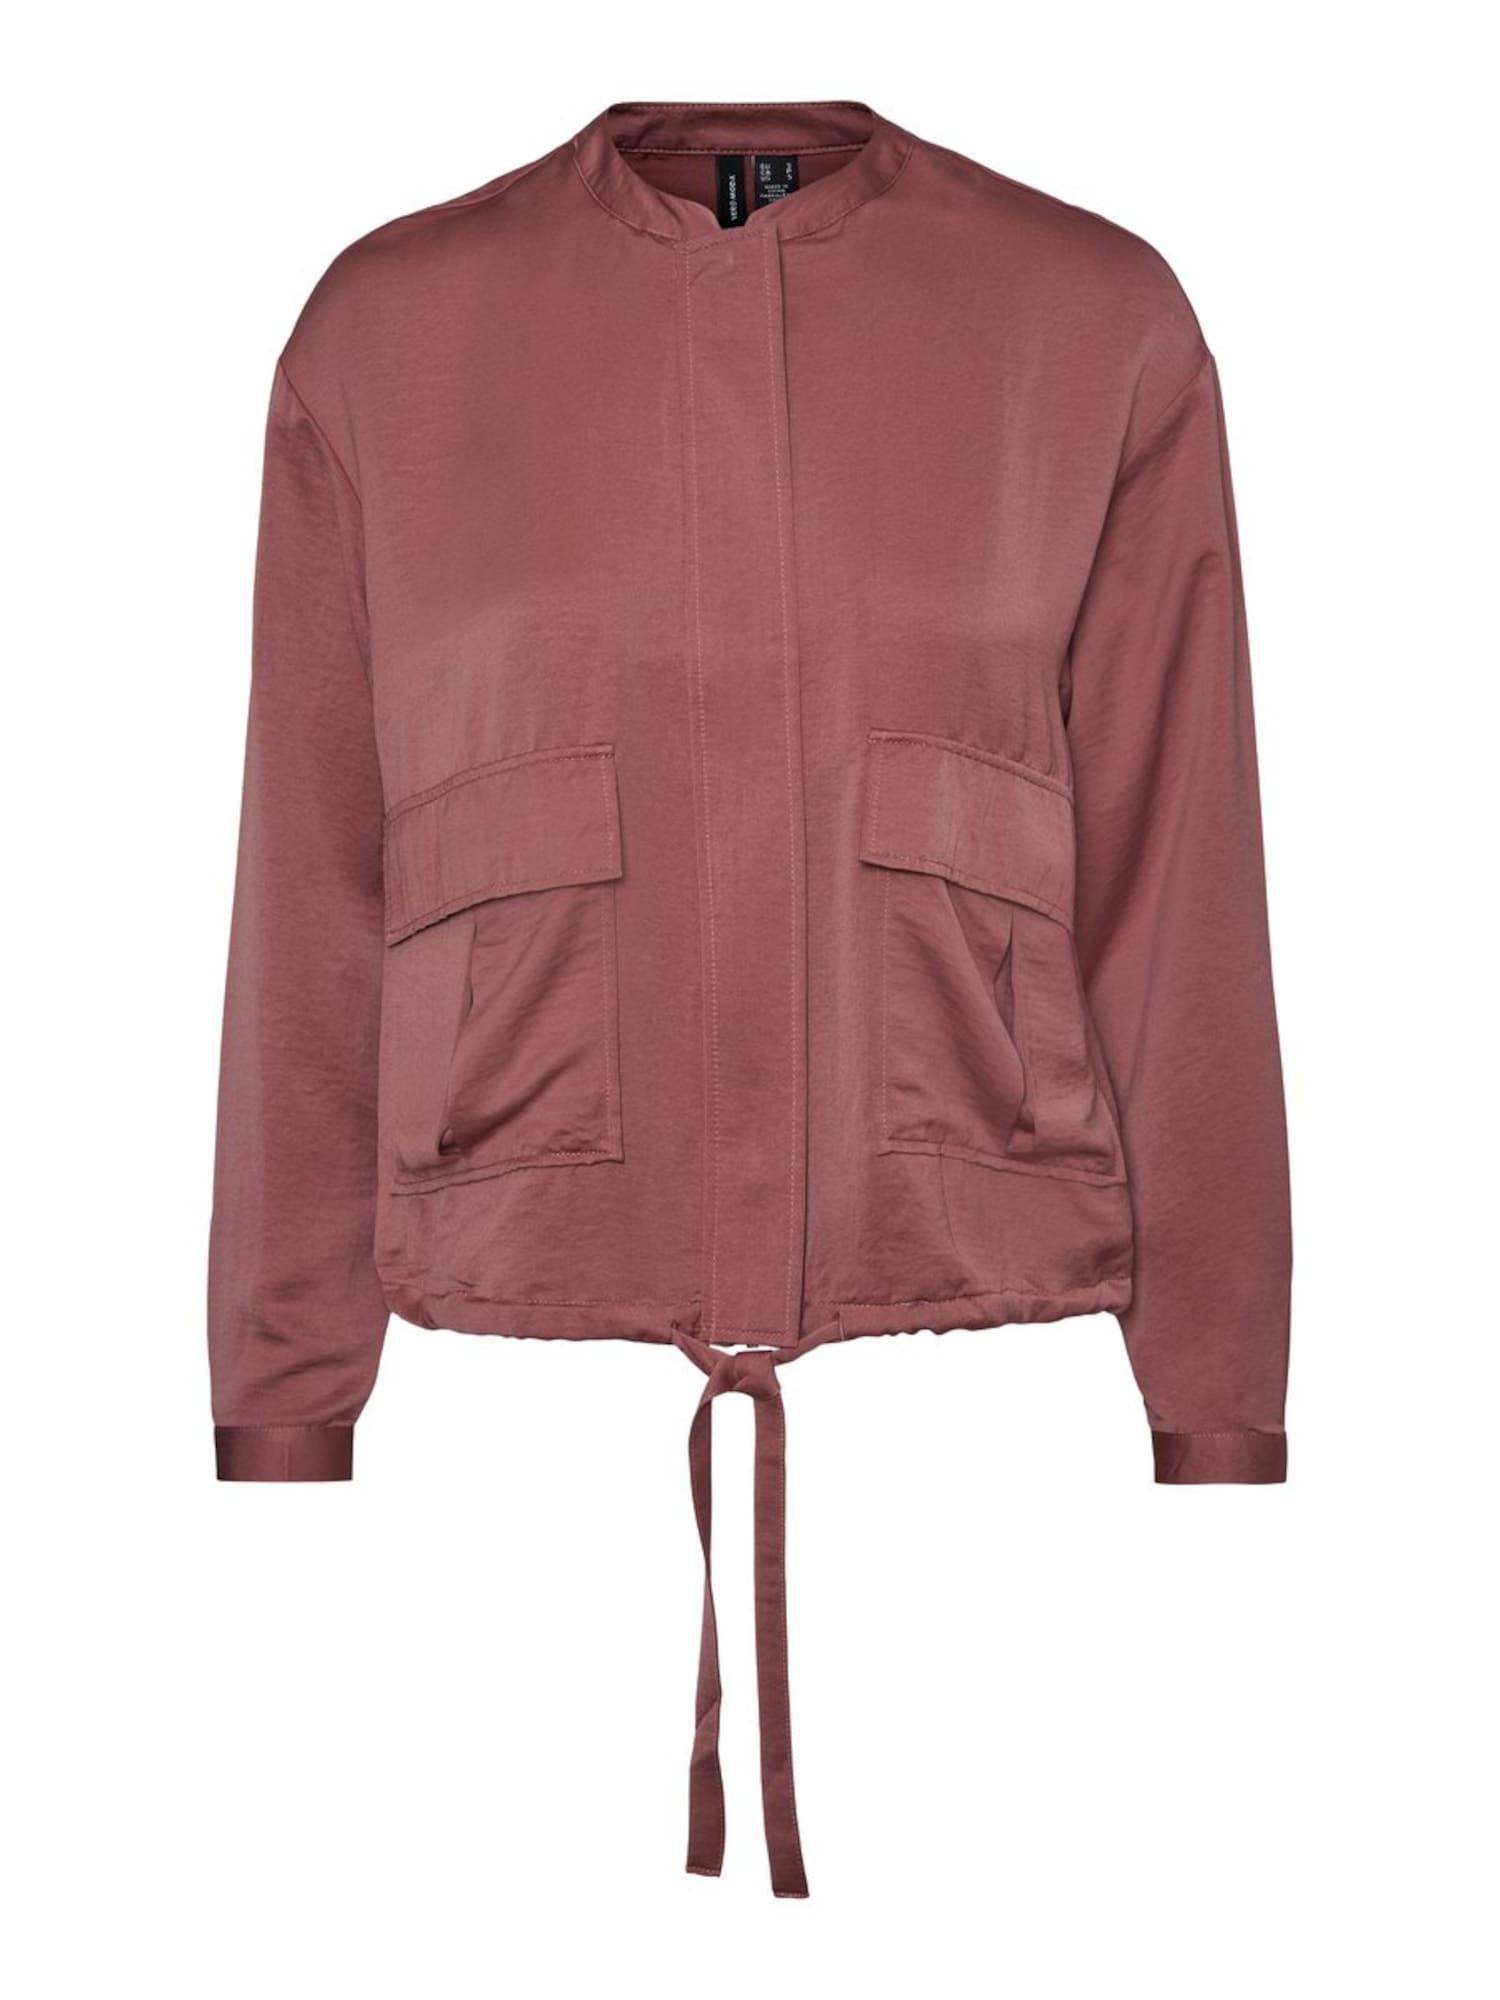 VERO MODA Demisezoninė striukė 'Freja' rožinio aukso spalva